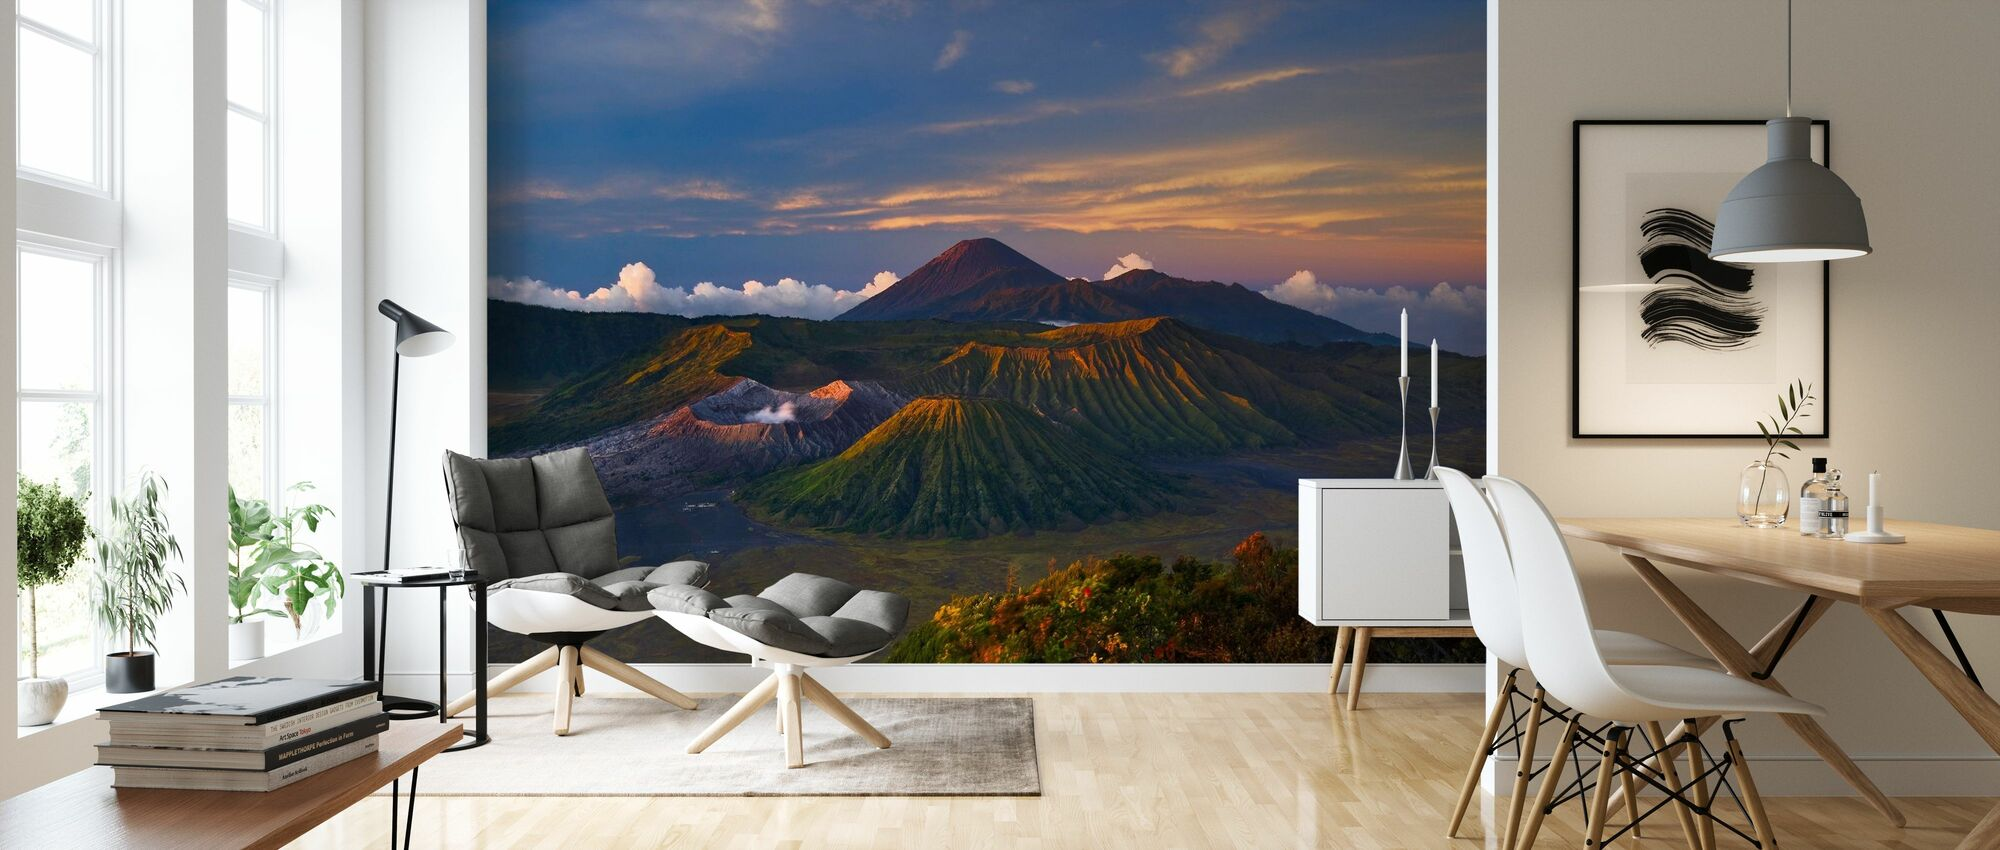 Volcano Dawn - Wallpaper - Living Room